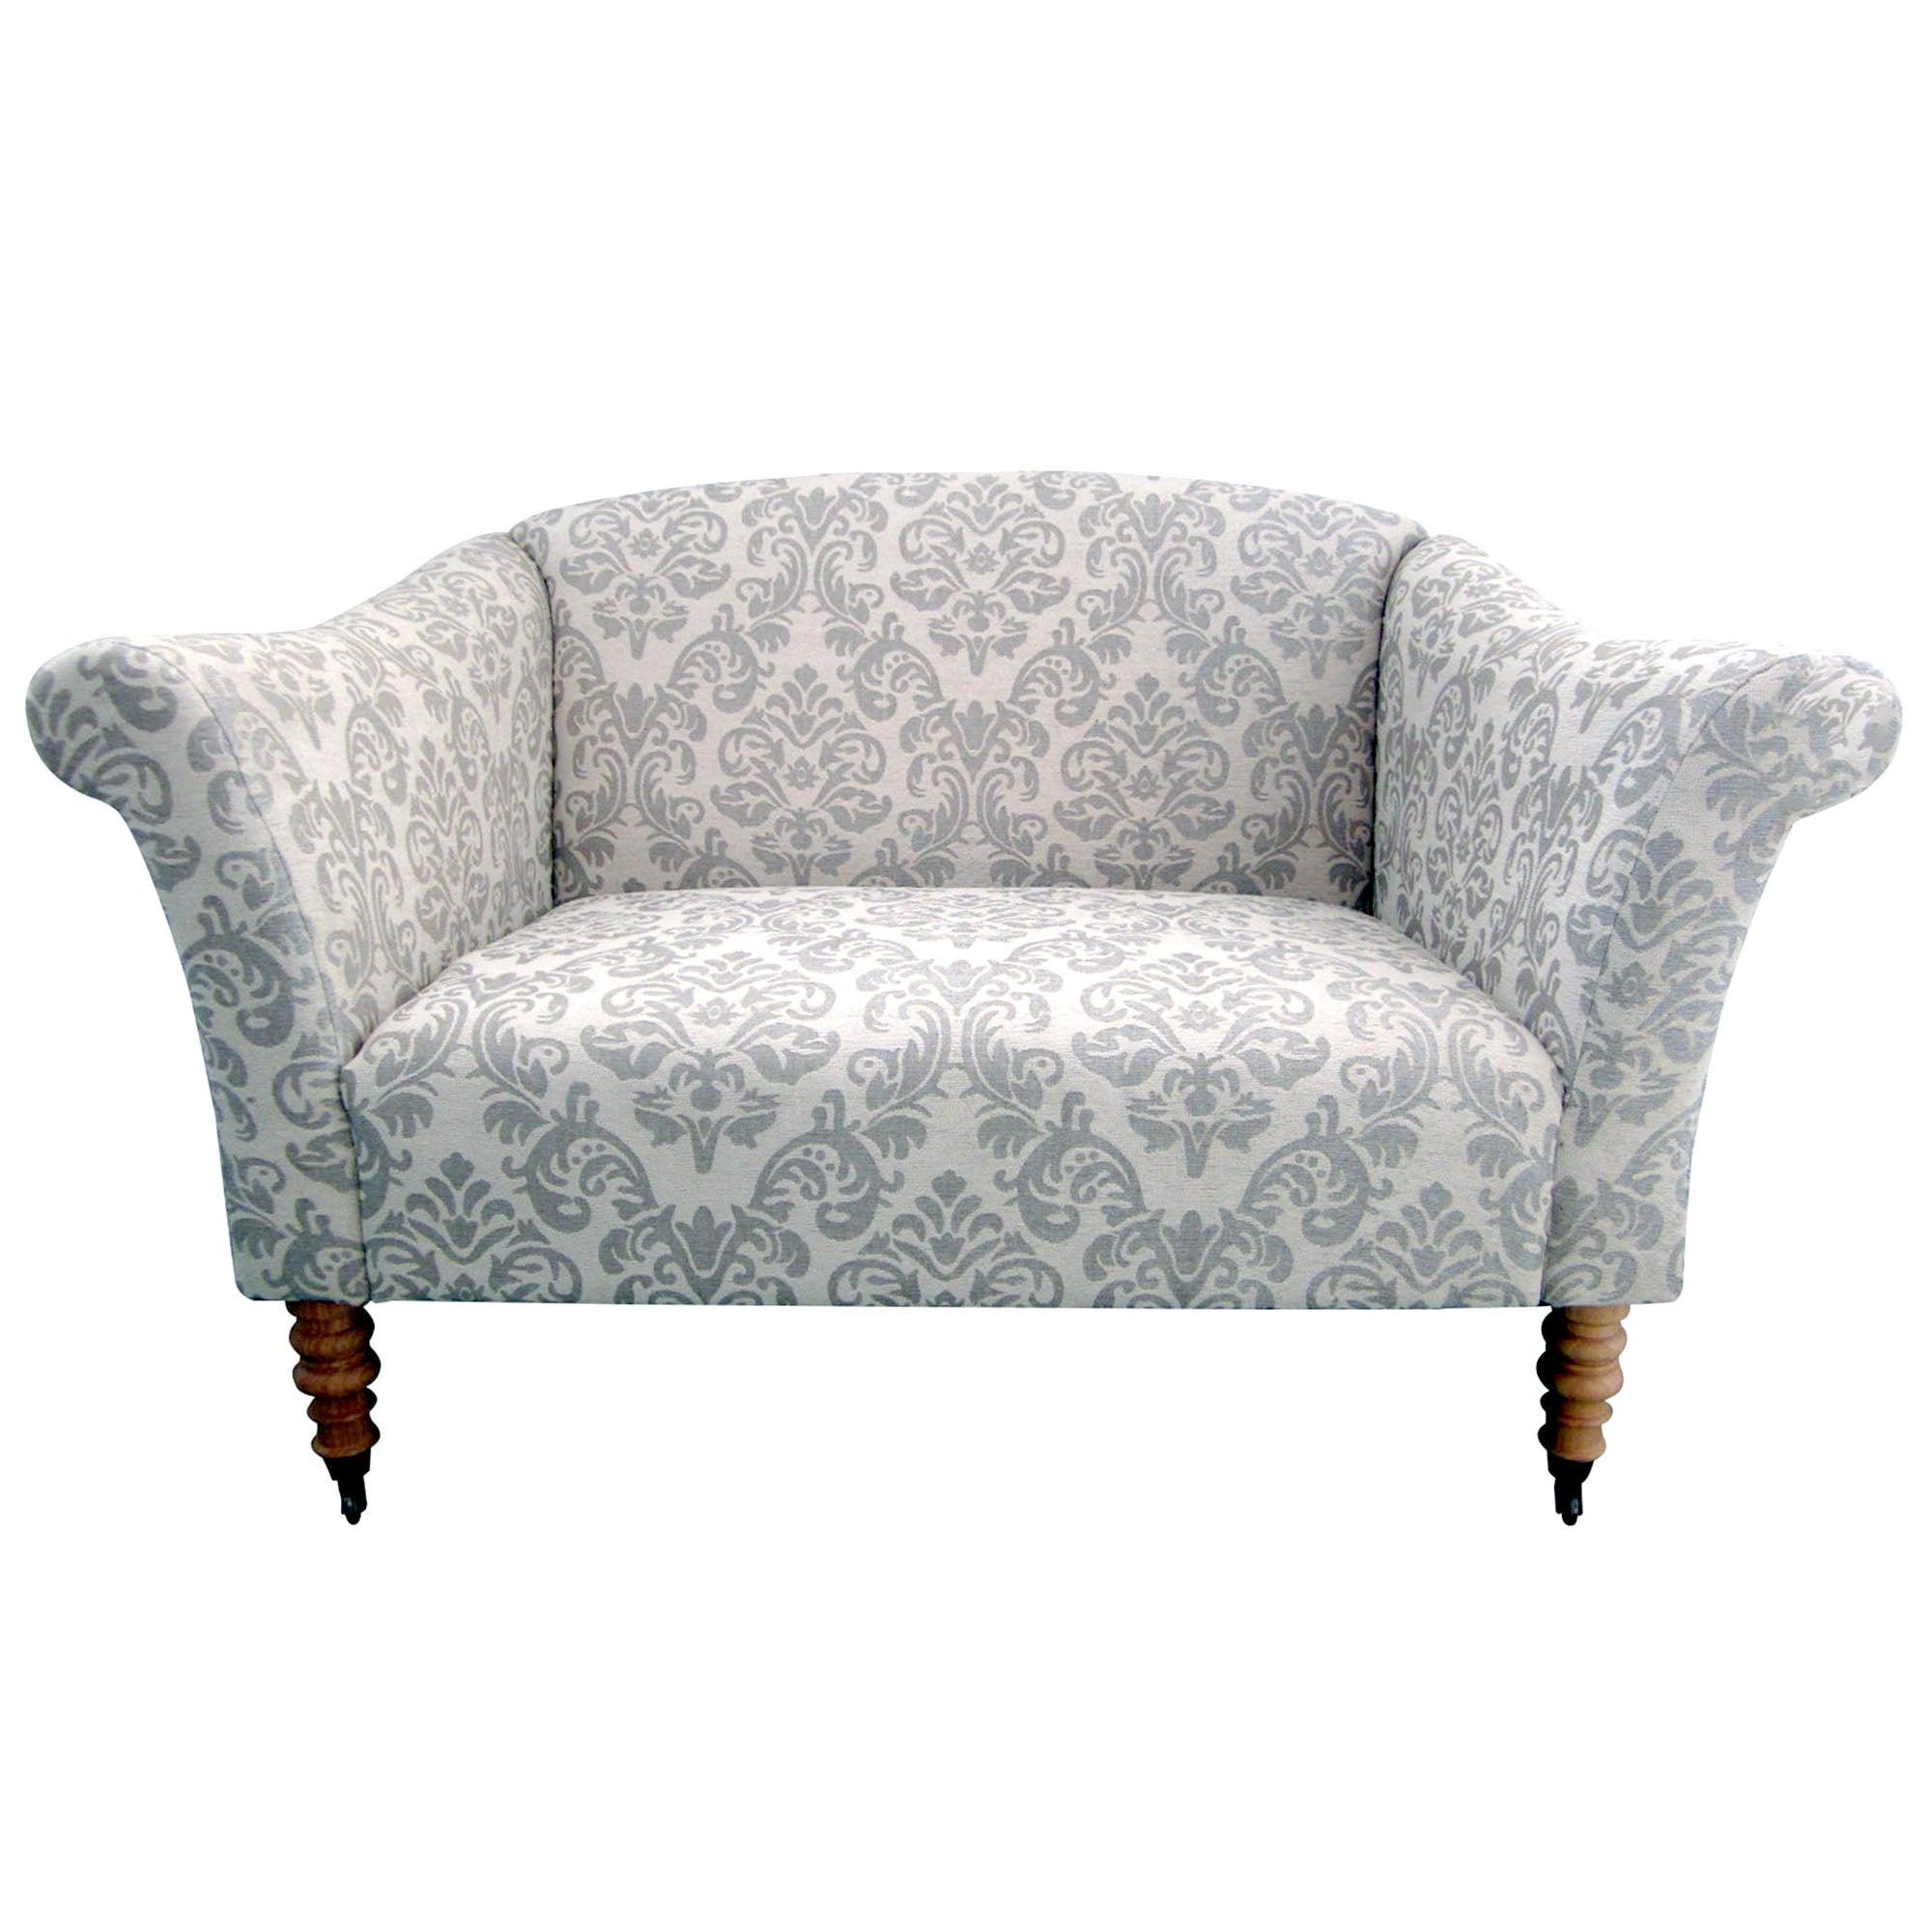 kensington snuggle chair dunelm. Black Bedroom Furniture Sets. Home Design Ideas